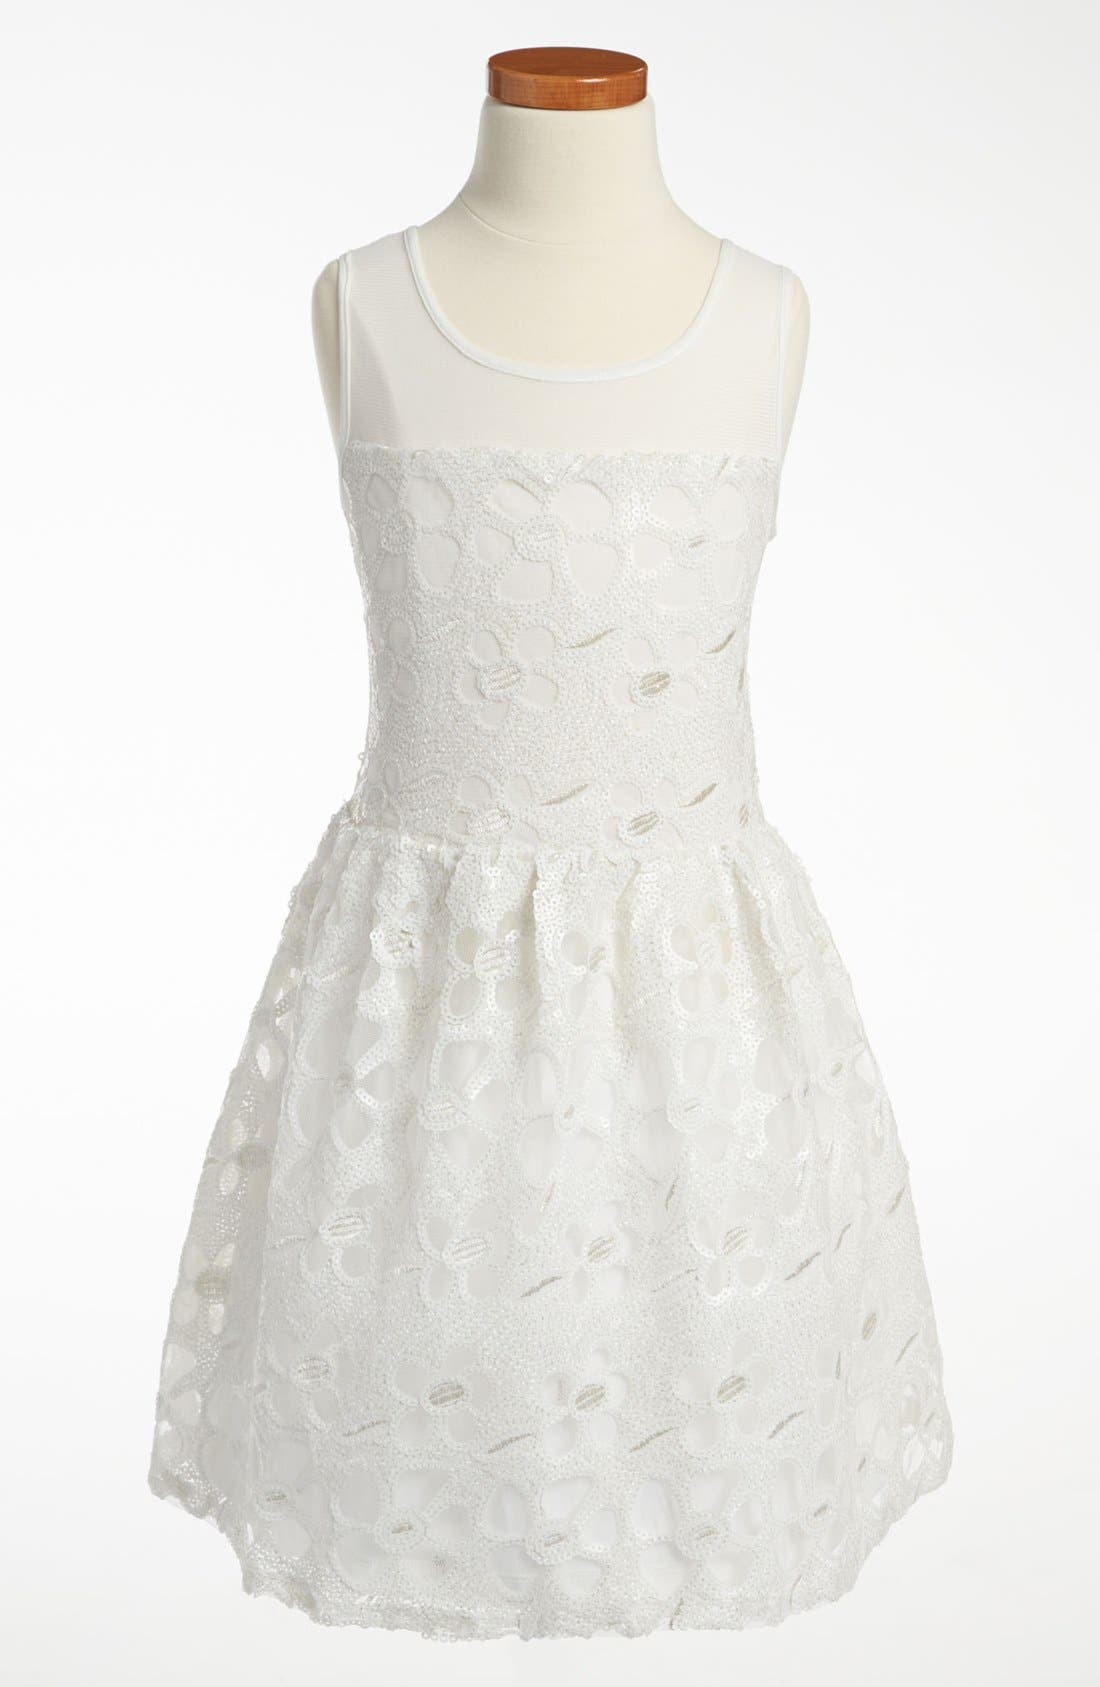 Alternate Image 1 Selected - Elisa B 'Daisy's Daisies' Dress (Big Girls)